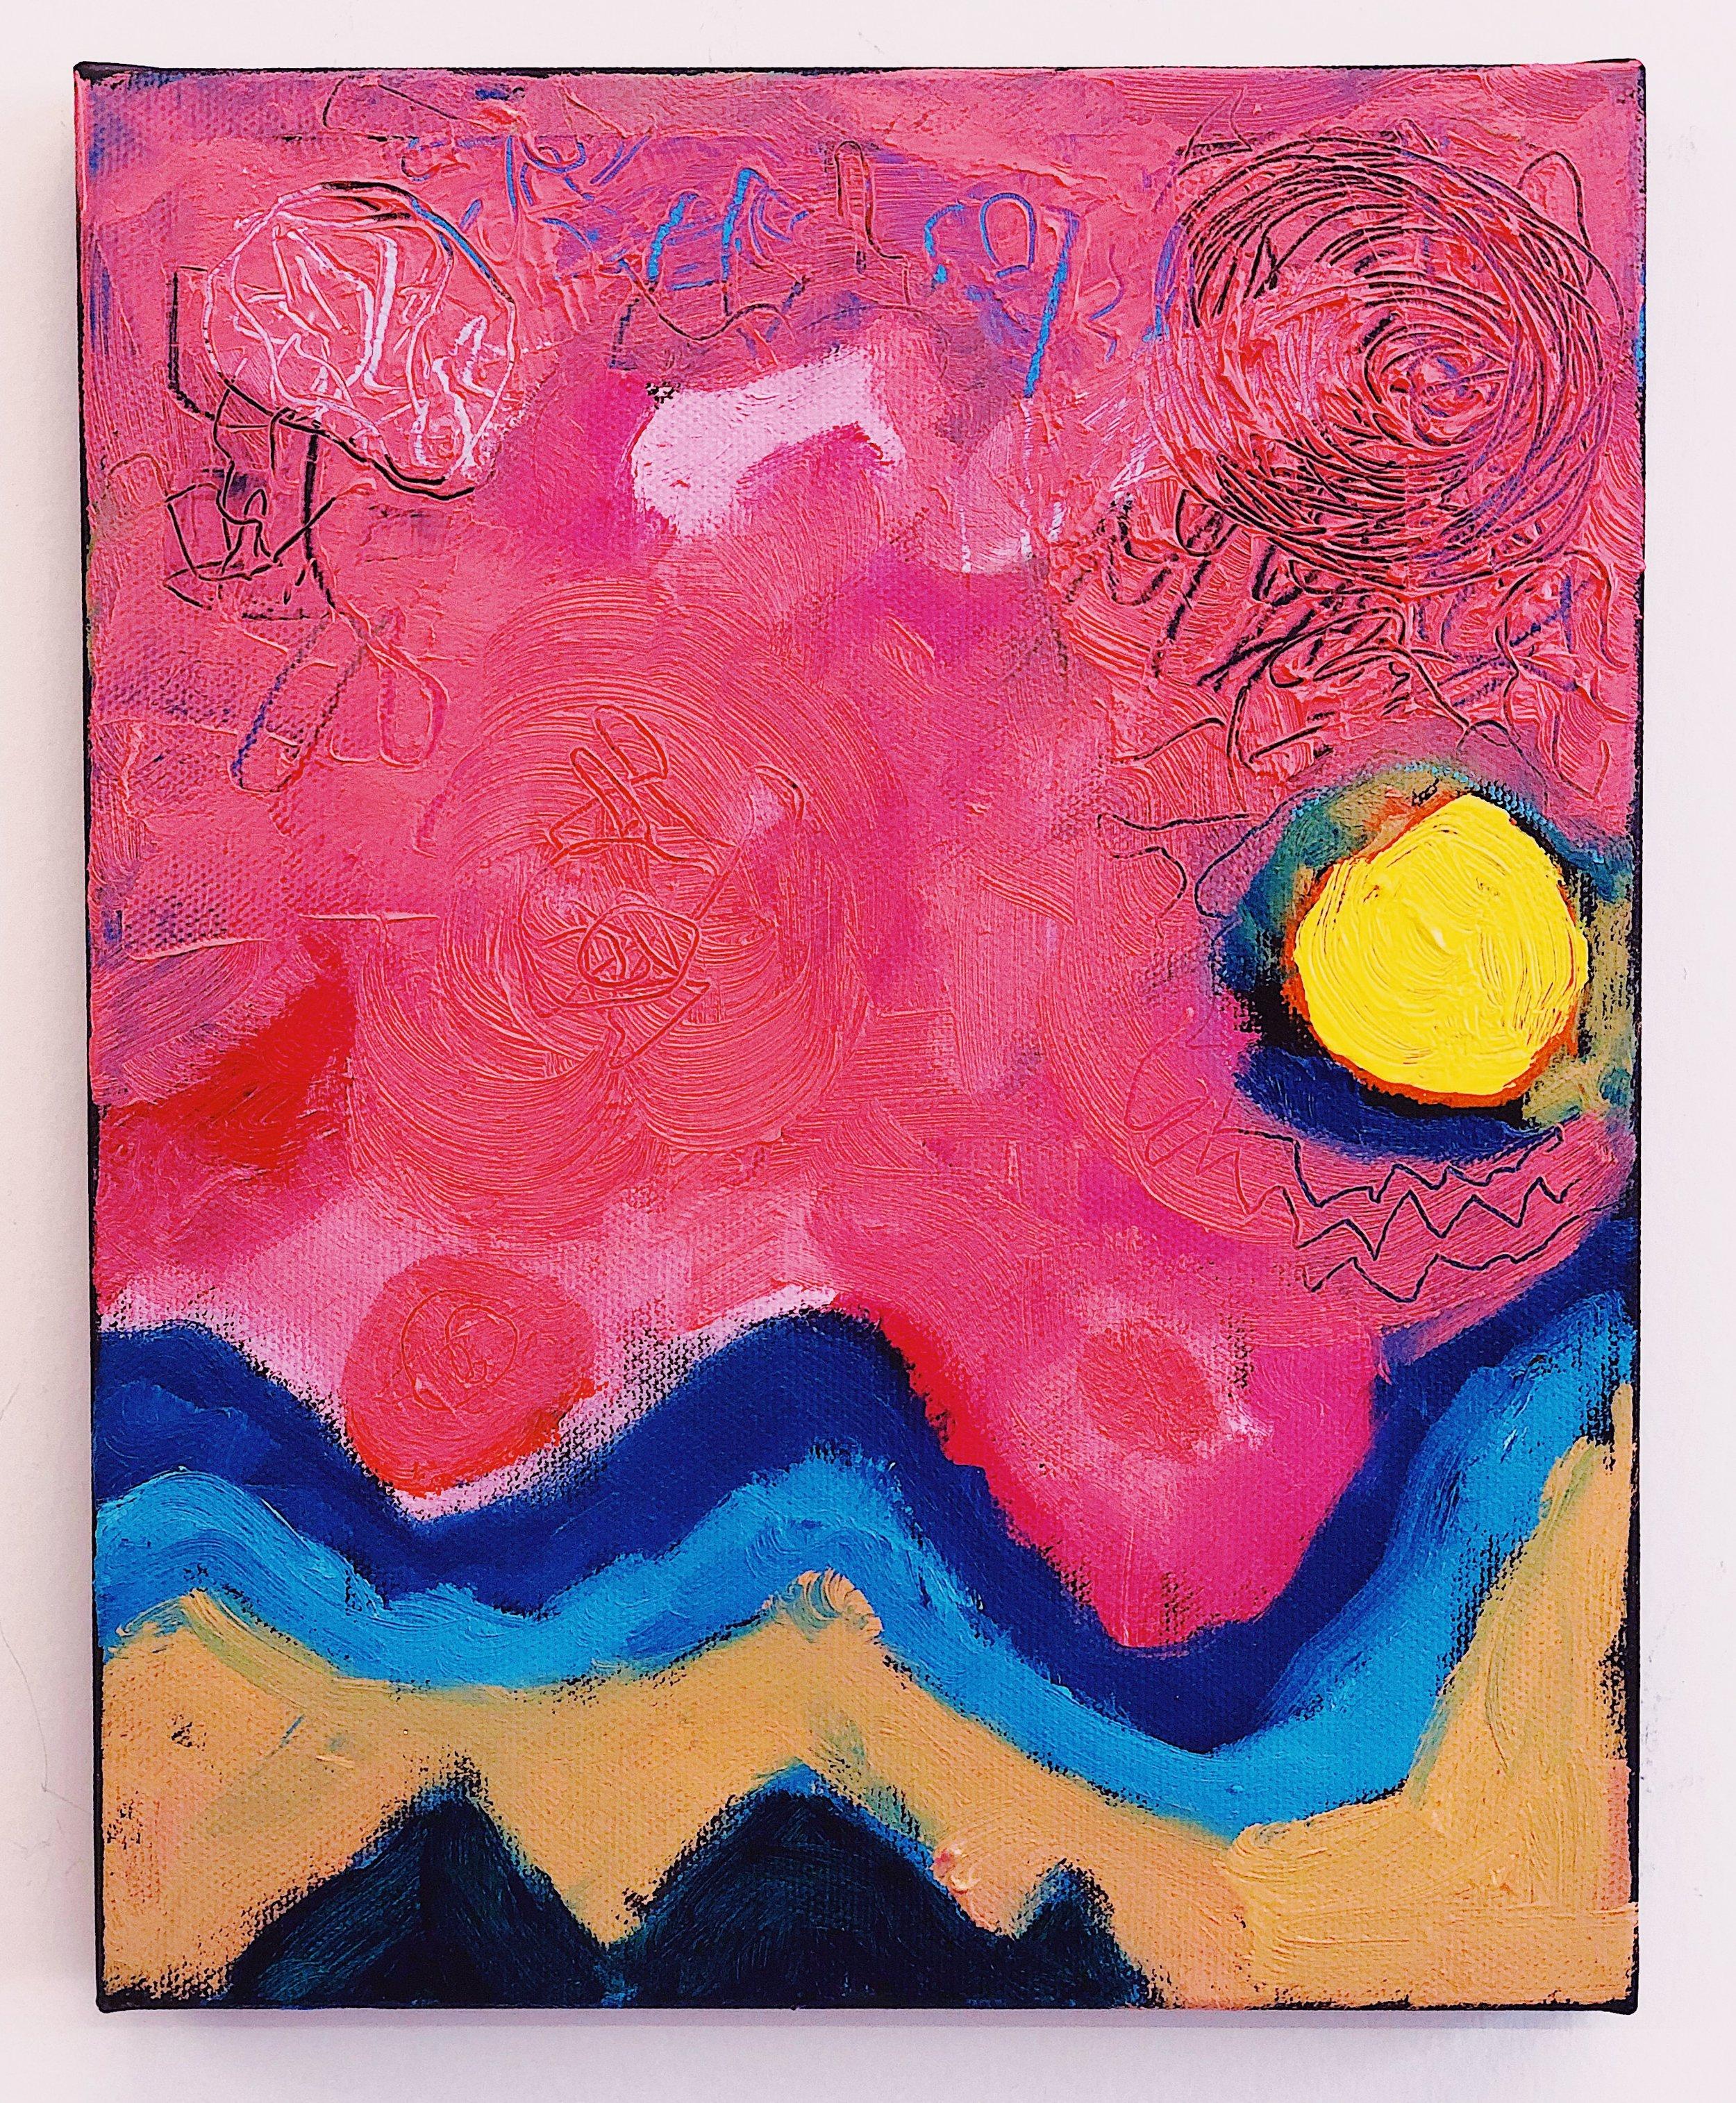 Pink Sky with Undulating Ground  (2016)